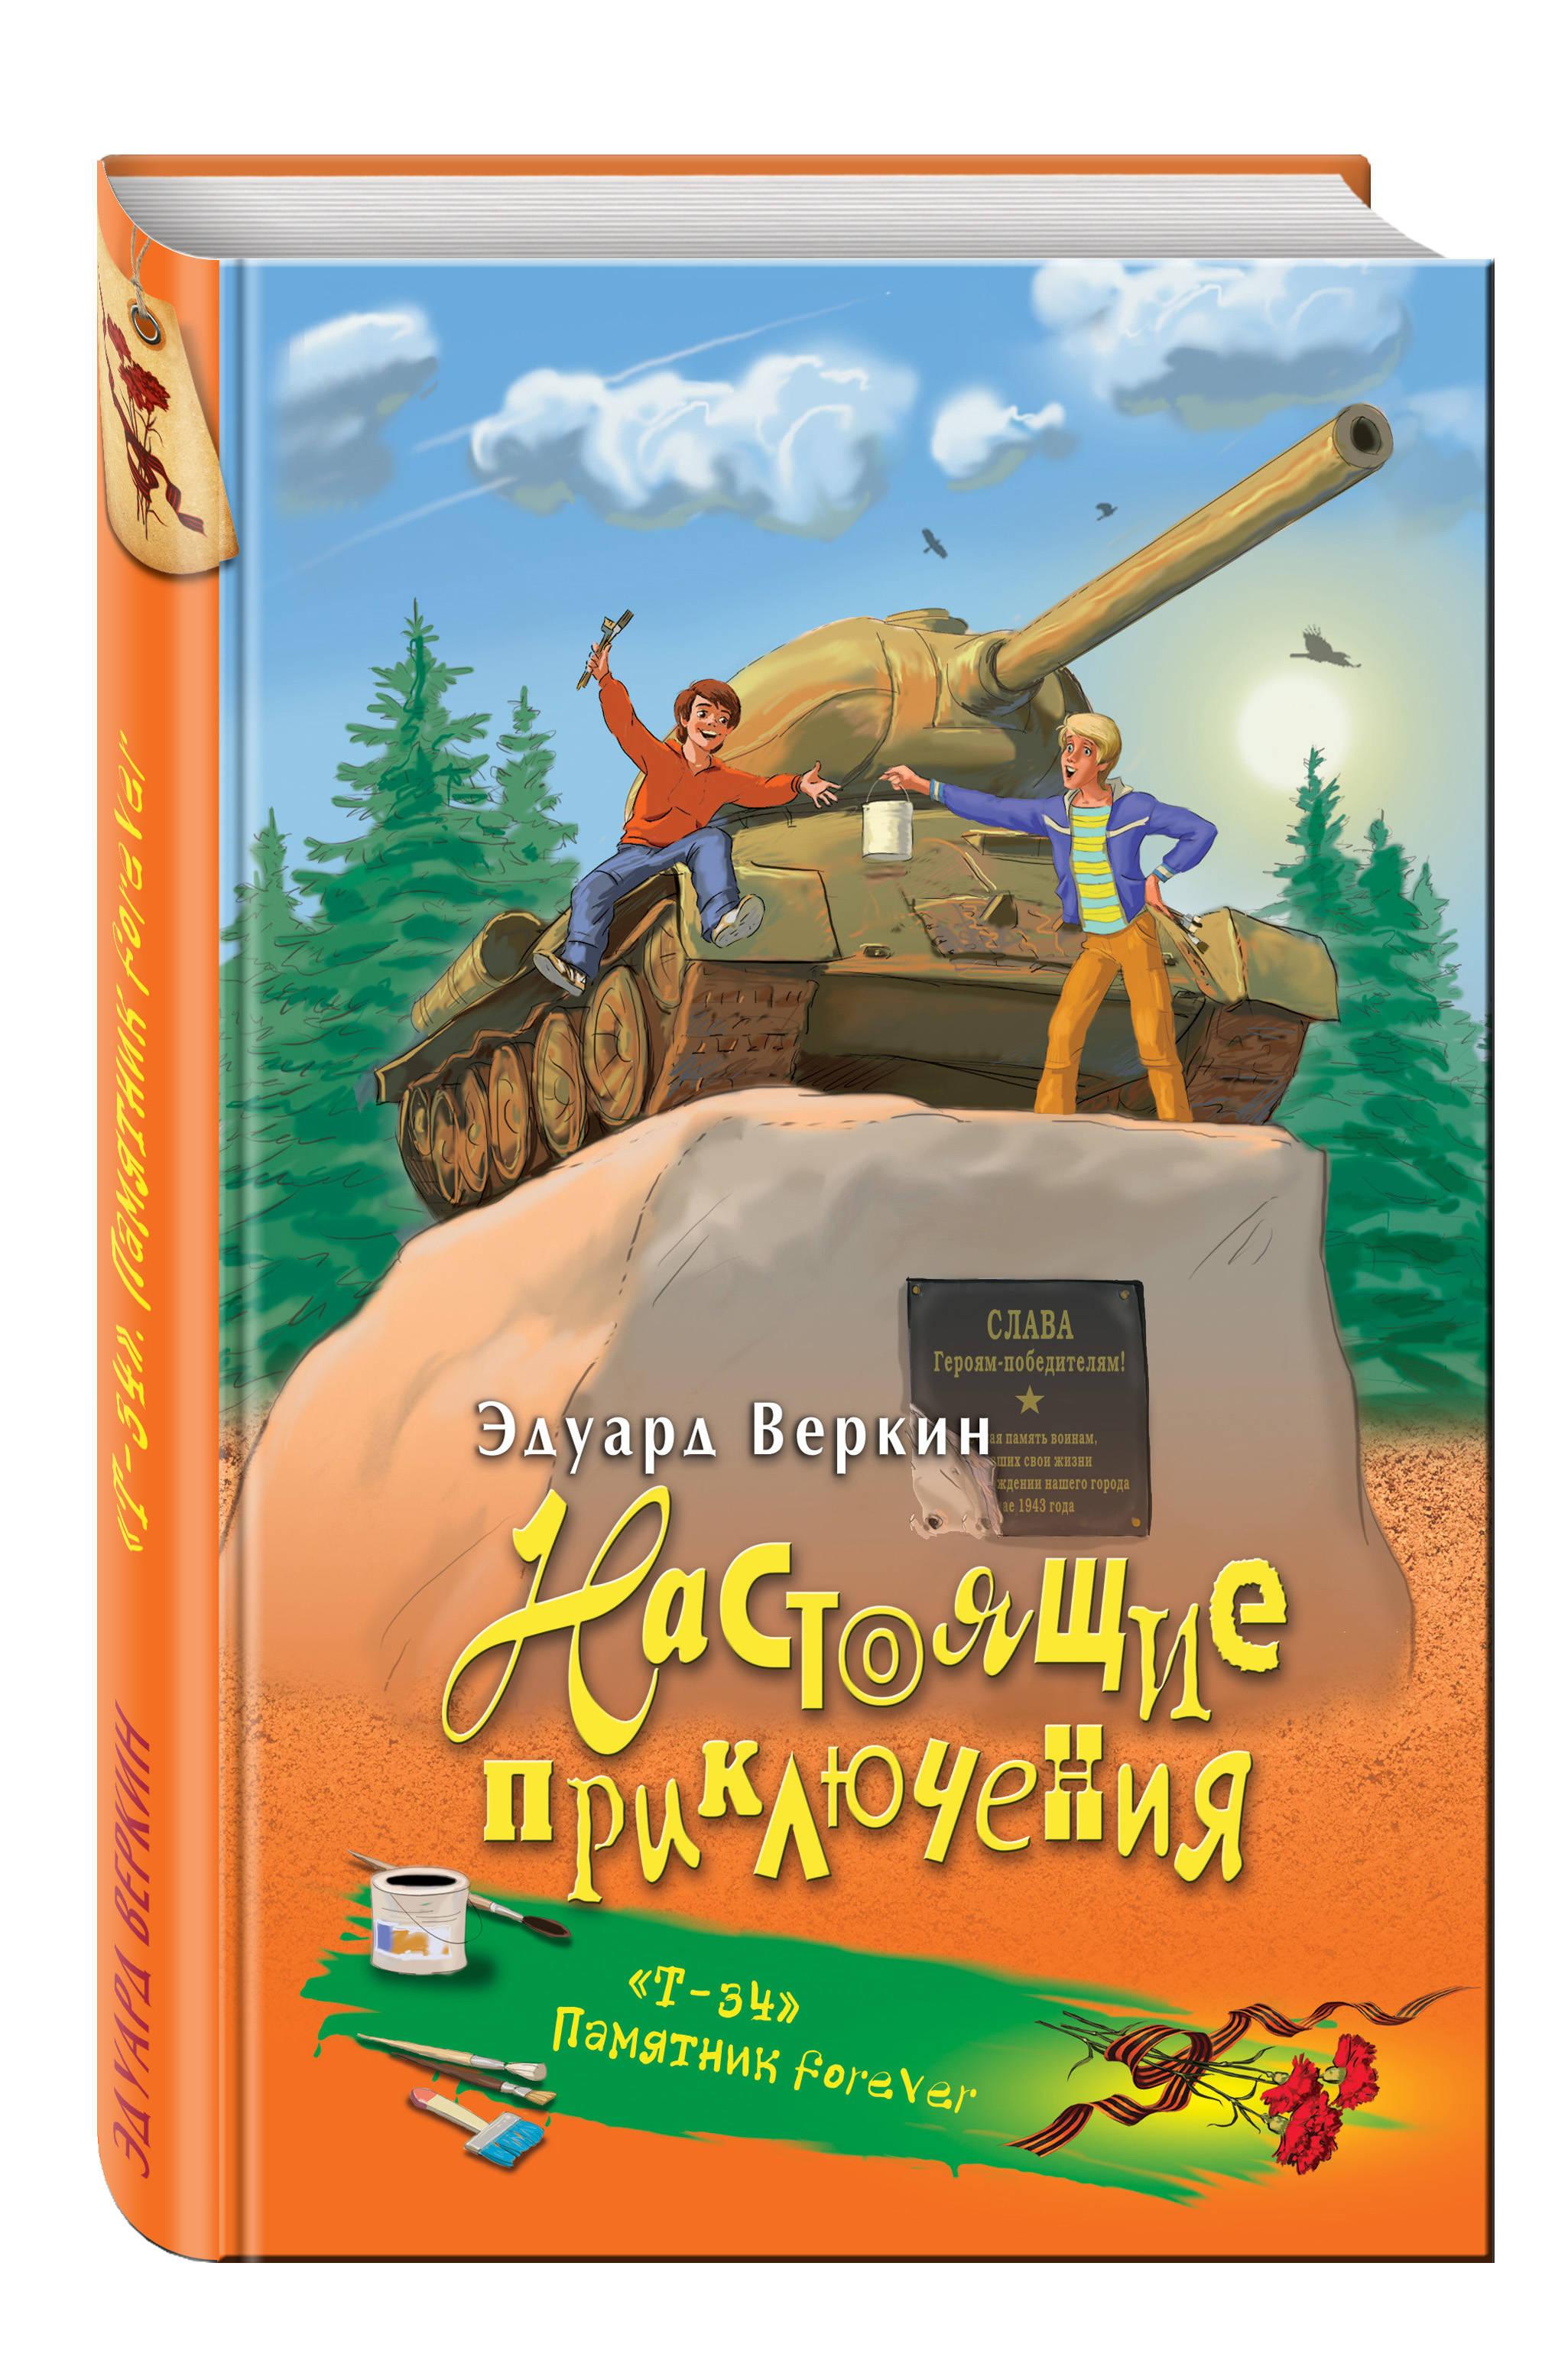 """Т-34"". Памятник forever от book24.ru"